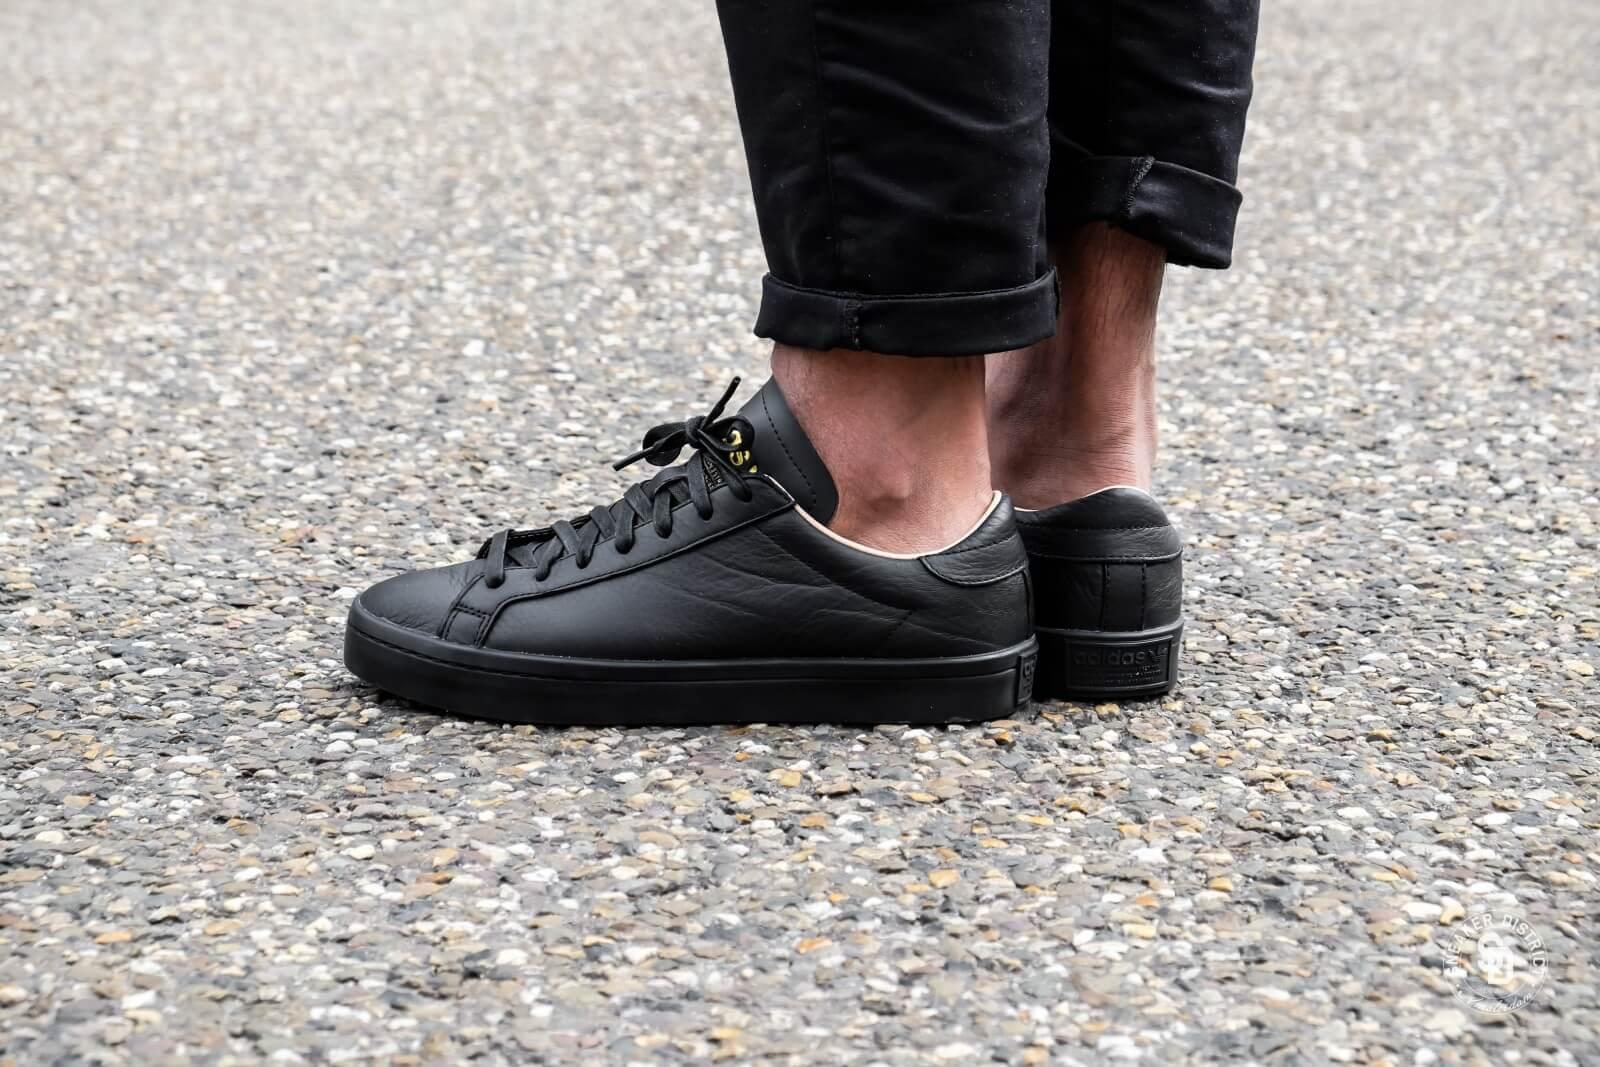 Adidas Court Vantage Leather Black